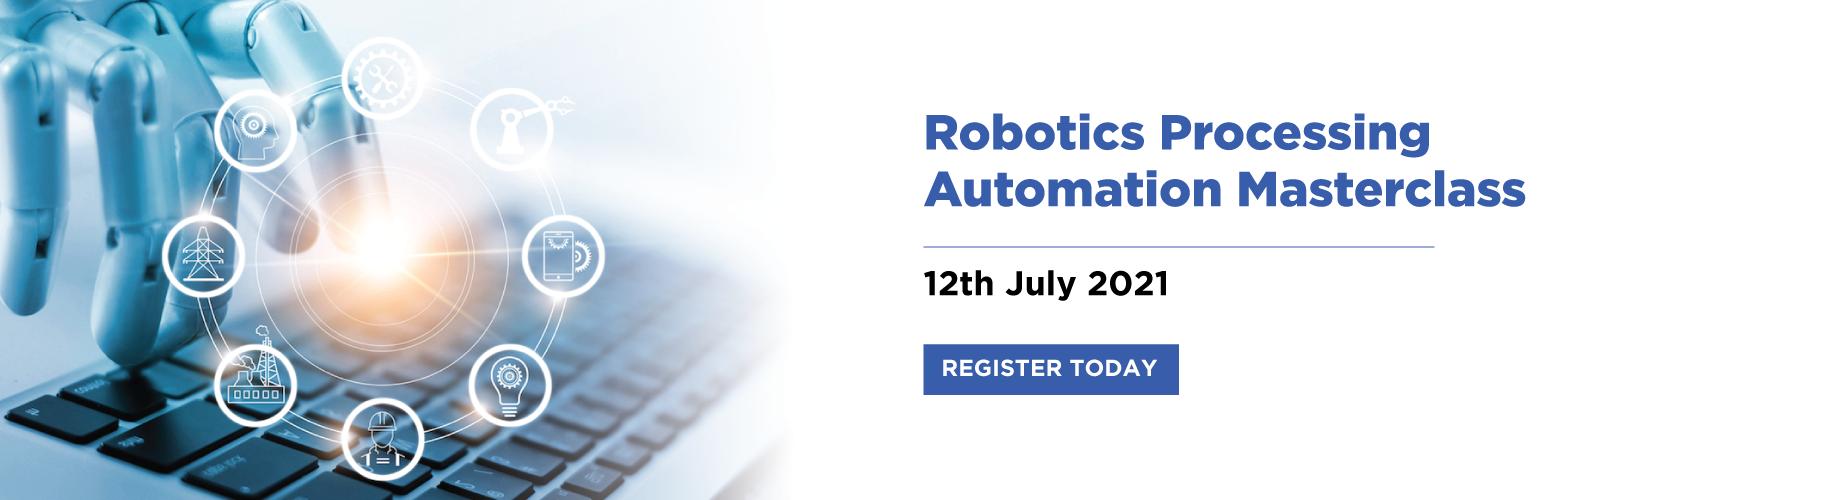 WEB-BANNER-Robotics-Processing-Automation-Masterclass